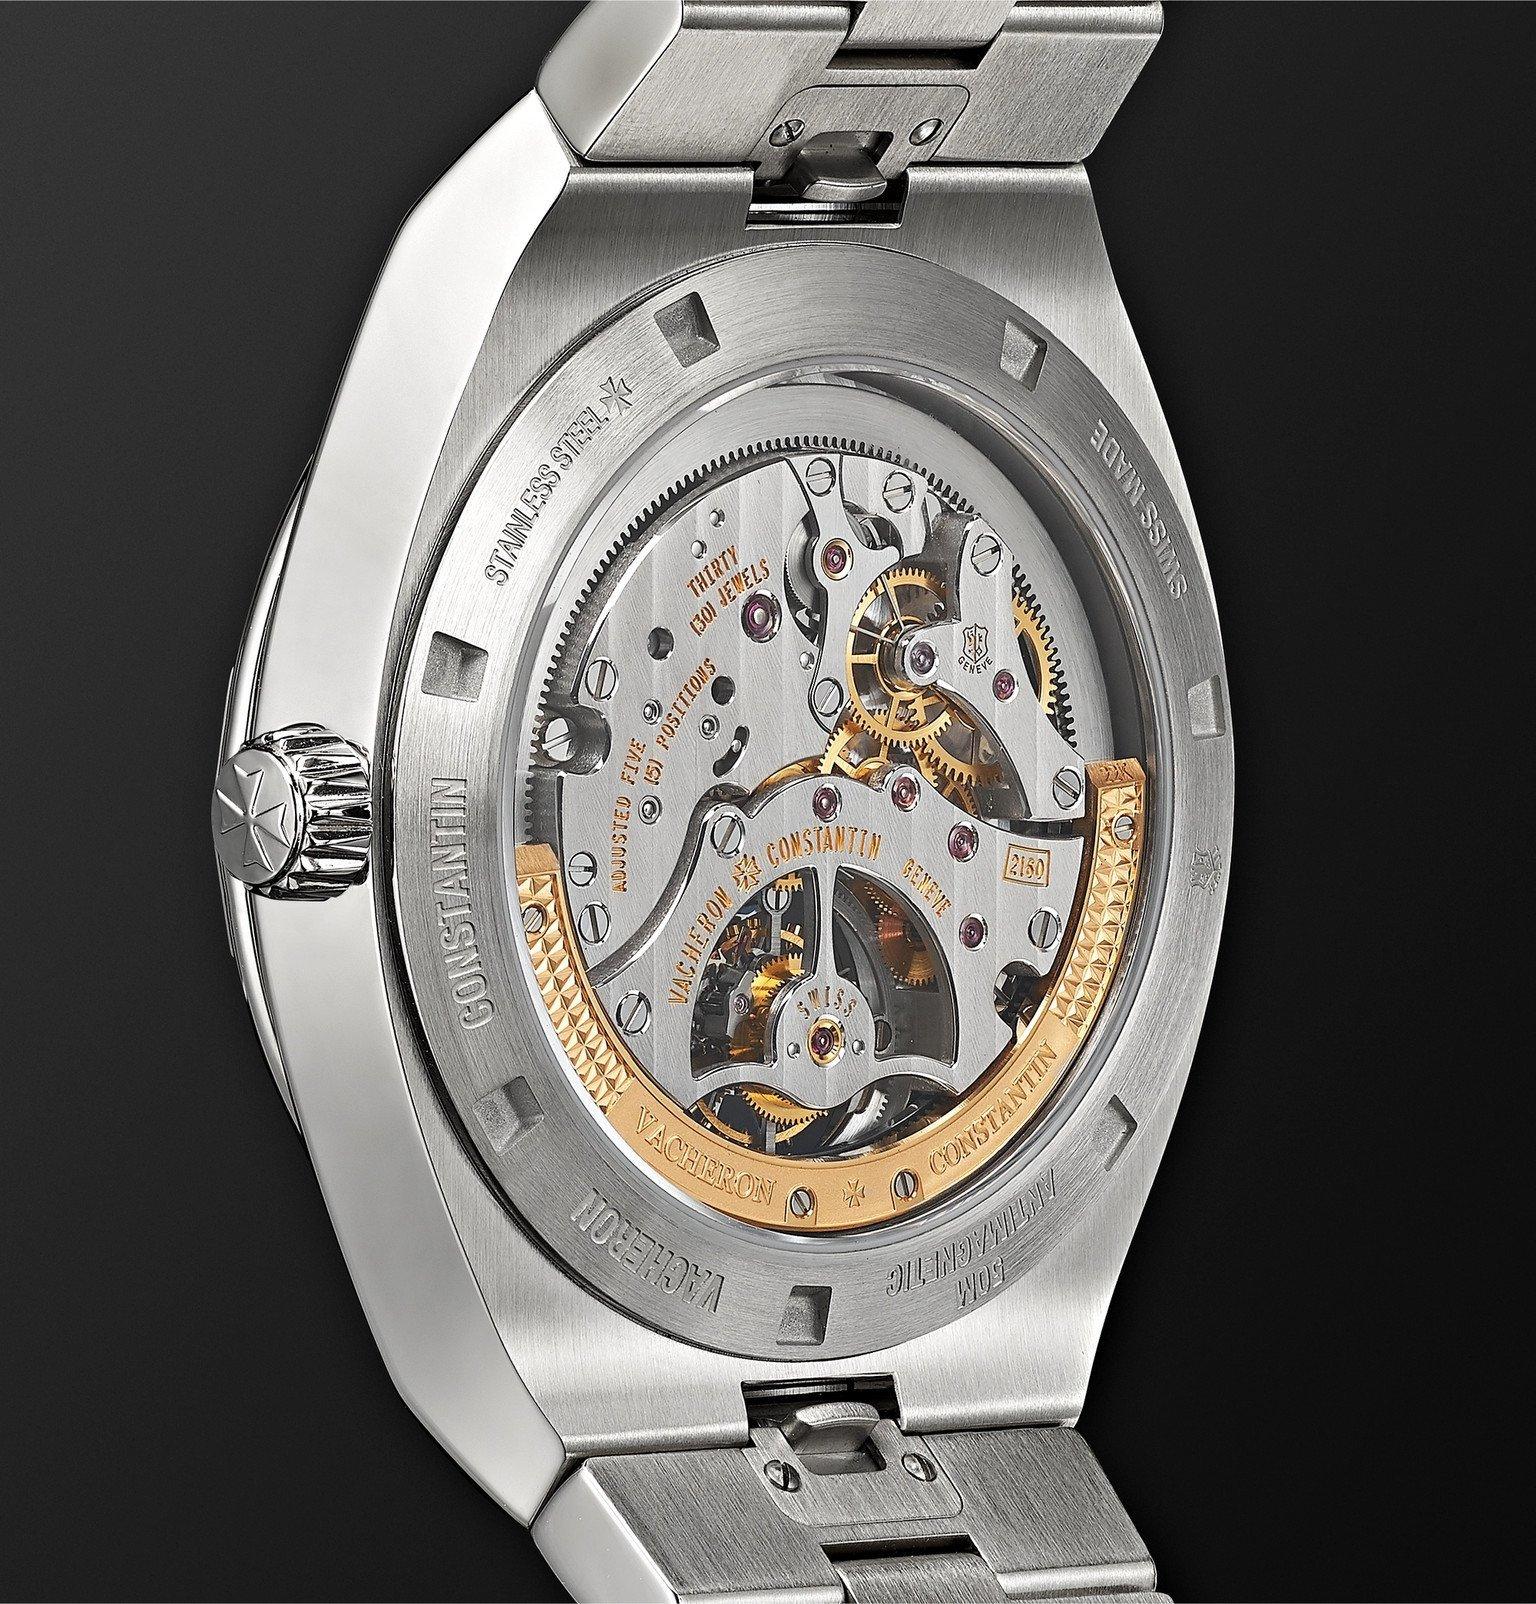 Vacheron Constantin - Overseas Tourbillon Automatic 42.5mm Stainless Steel Watch, Ref. No 6000V/110A-B544 - Blue